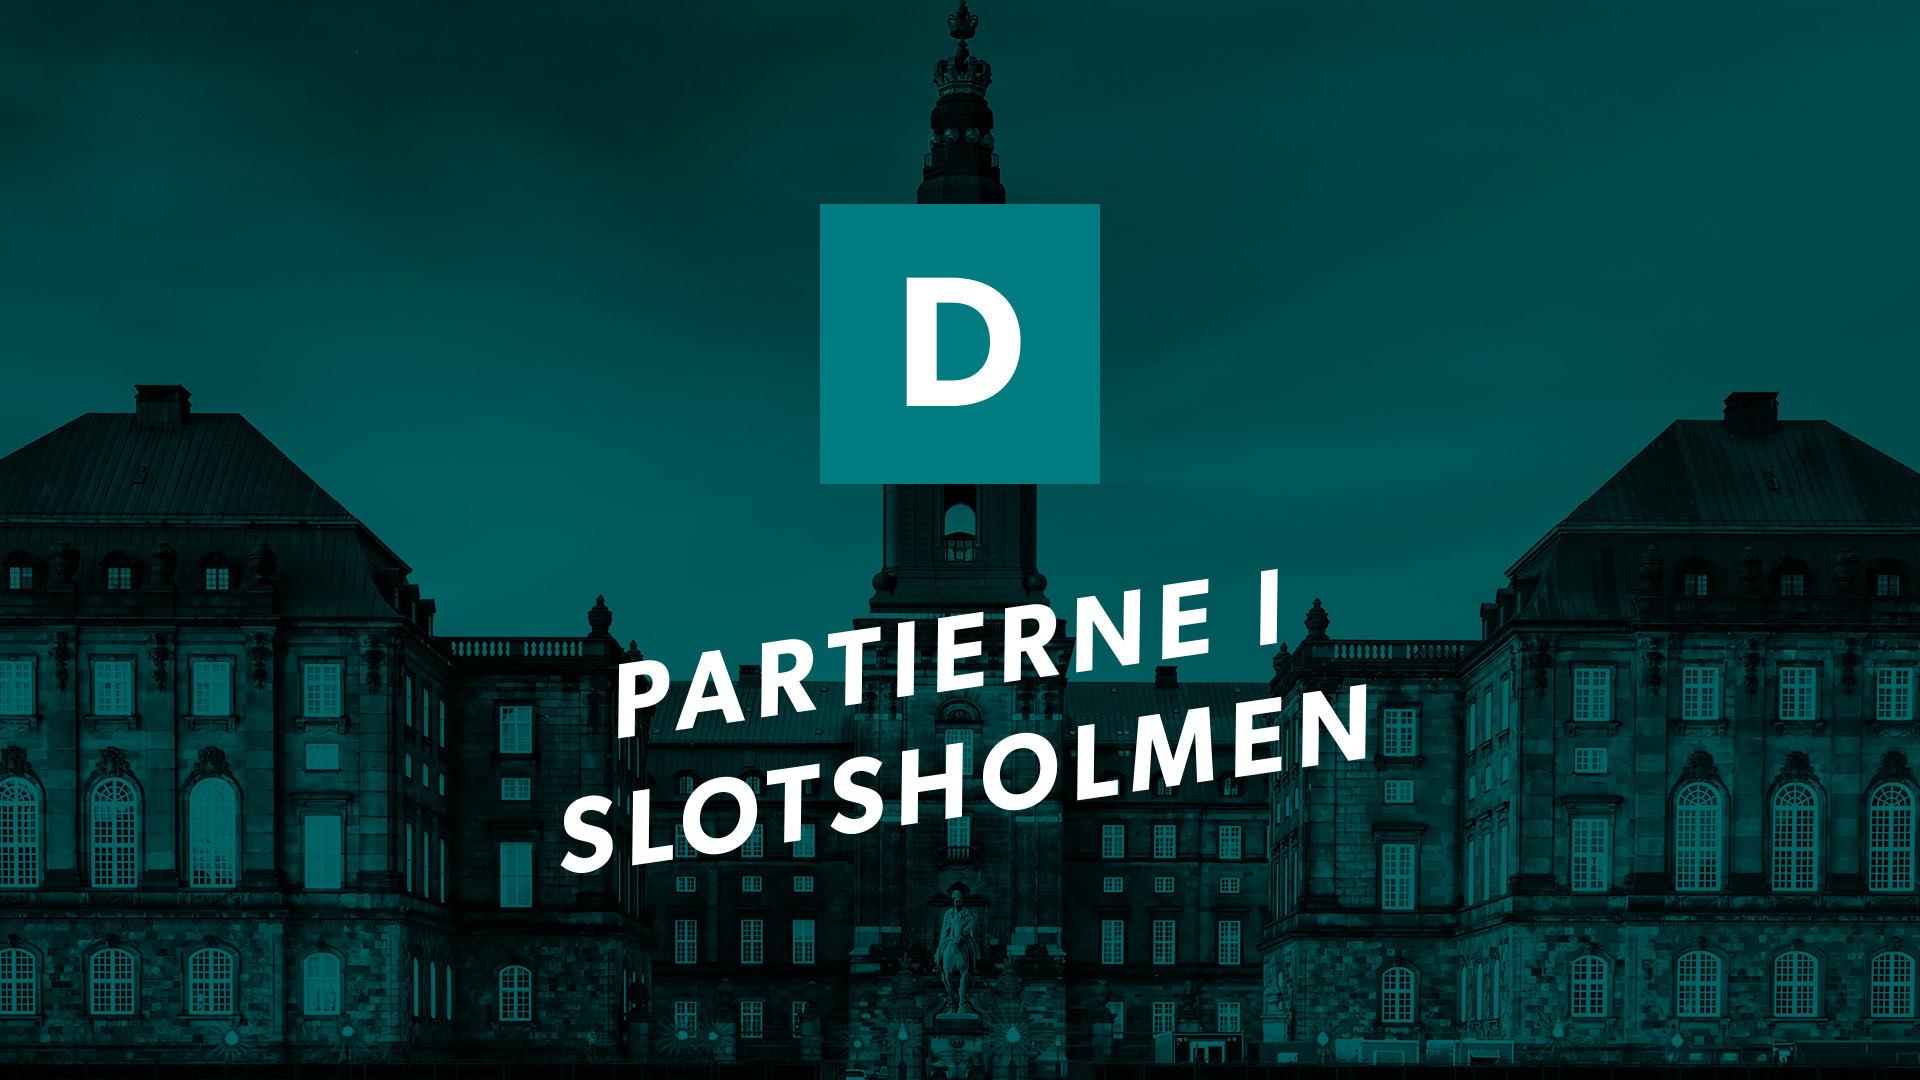 slotsholmen-nye-borgerlige.jpg